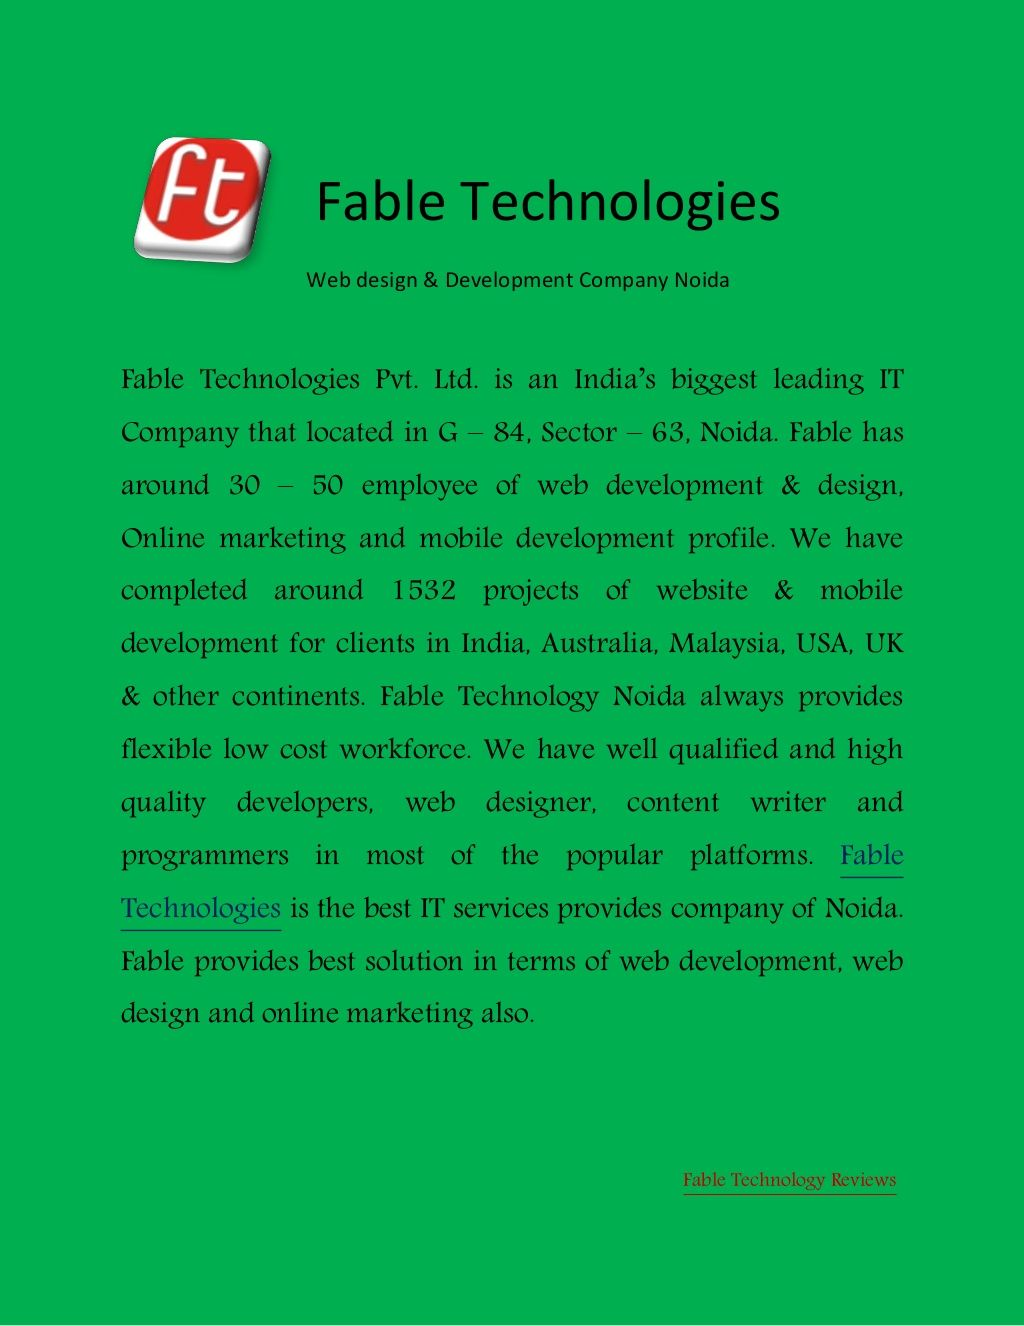 Fable Technologoes Web Development Webdesign Company Noida Sector 63 By Fable Technologies Noida Via Slideshar Web Development Design Technology Fables